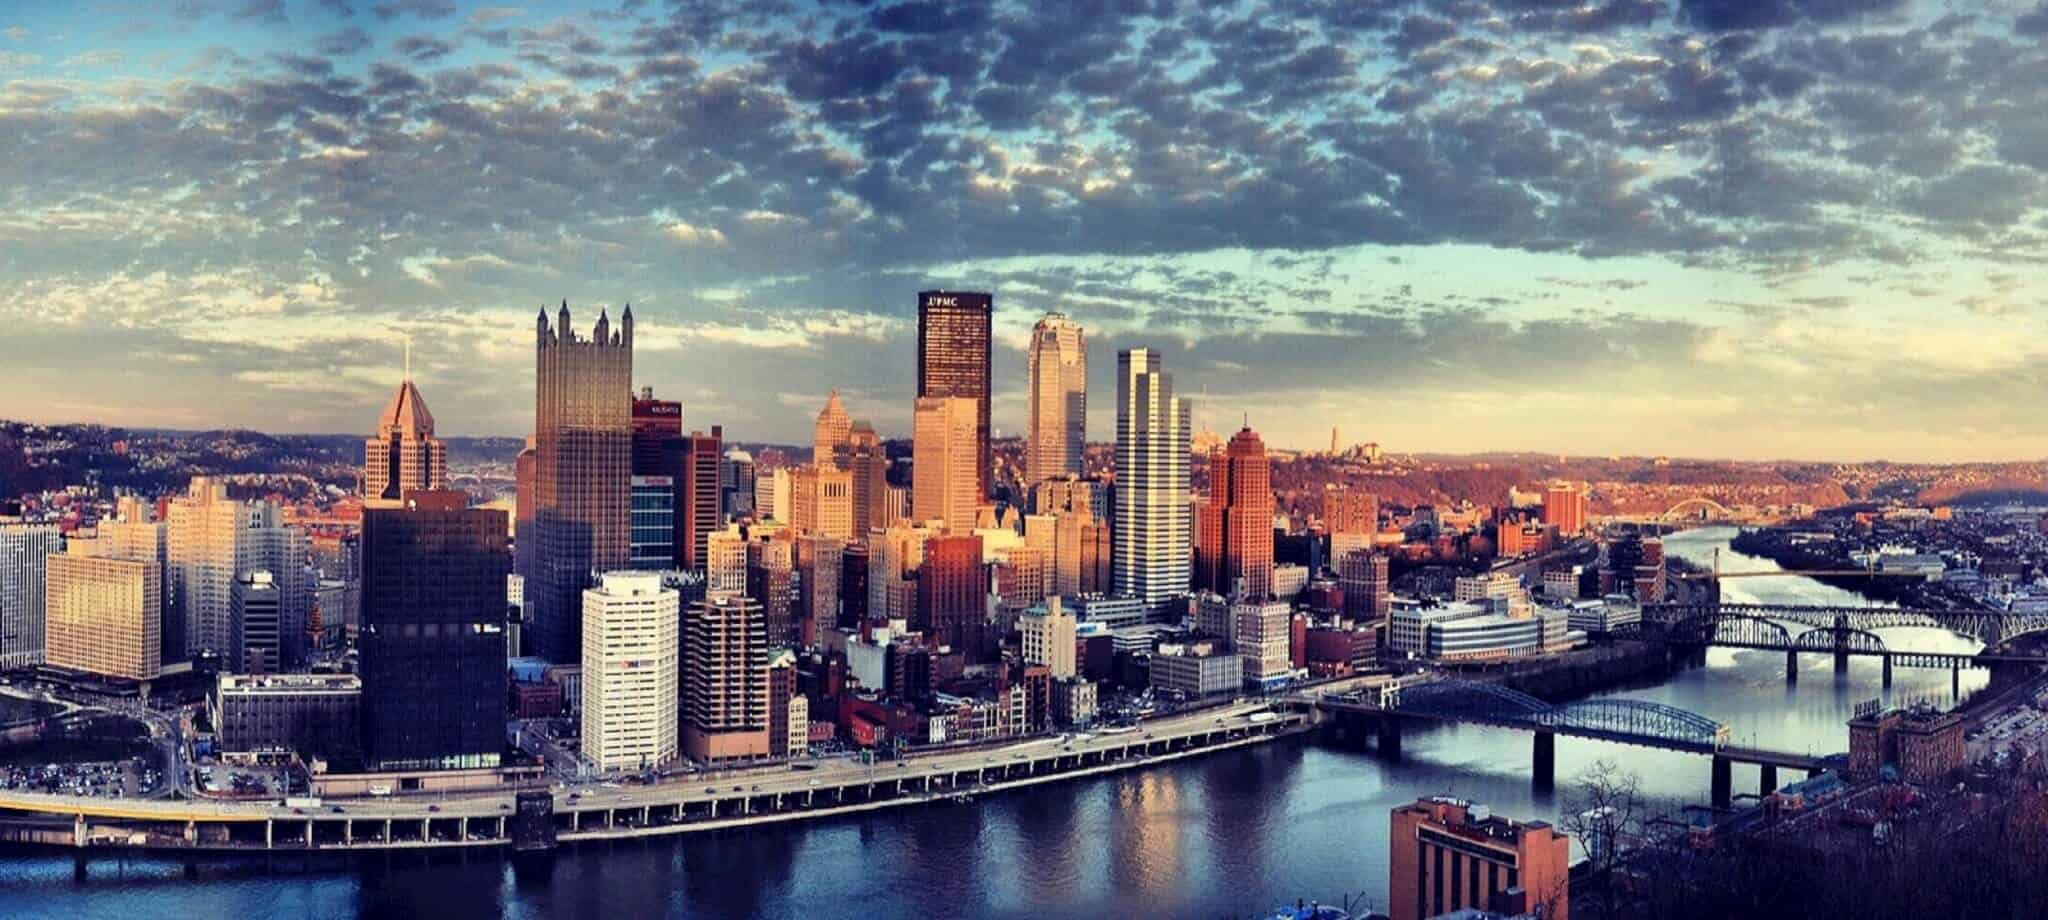 Seattle Washington Fall Skyline Wallpaper Pittsburgh Adoption Amp Foster Care Resources